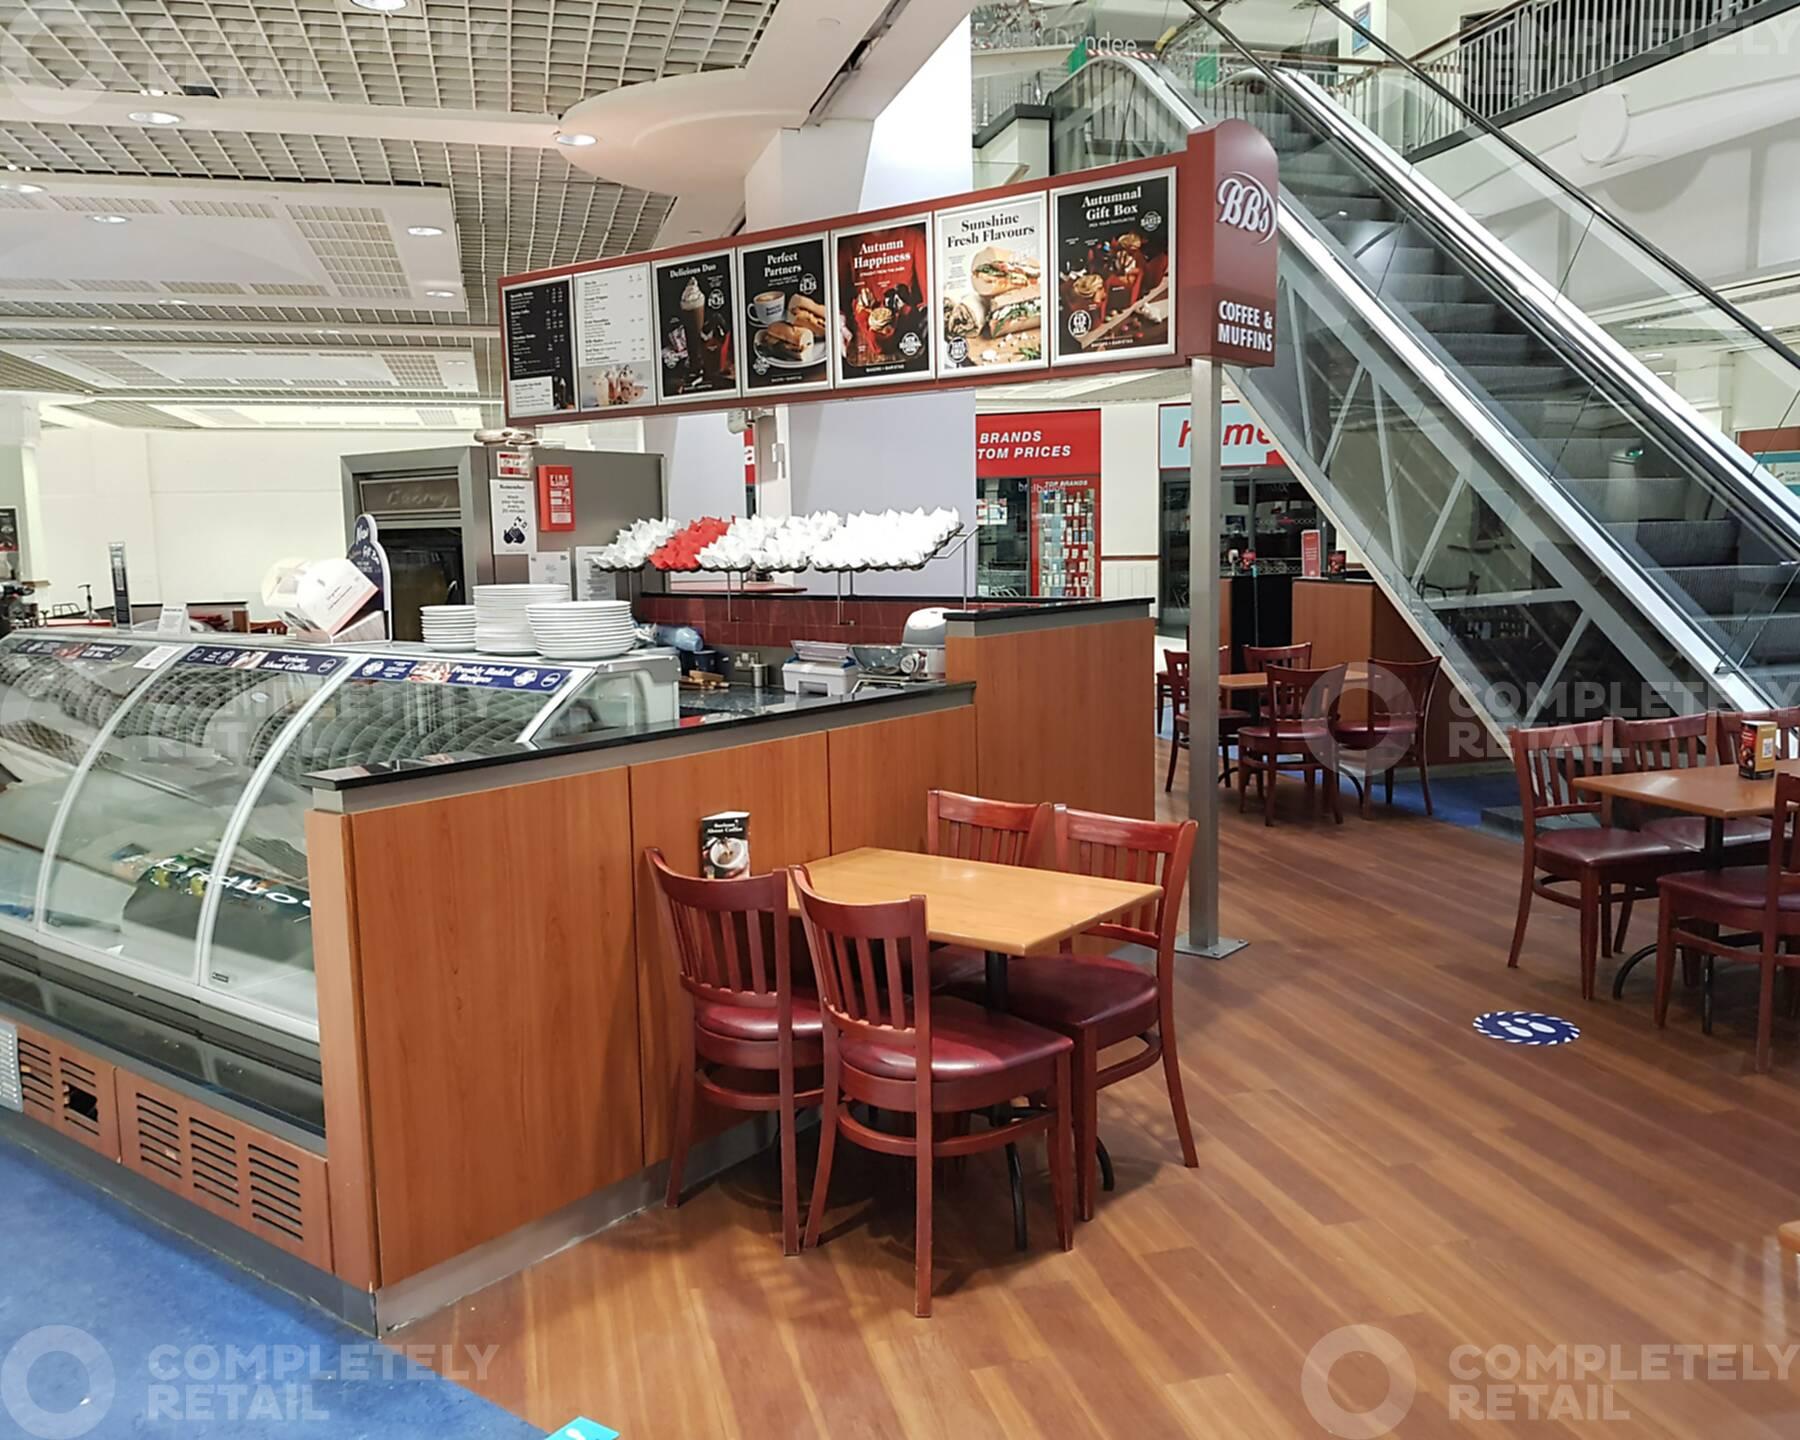 Unit 34, Level 2, Wellgate Shopping Centre